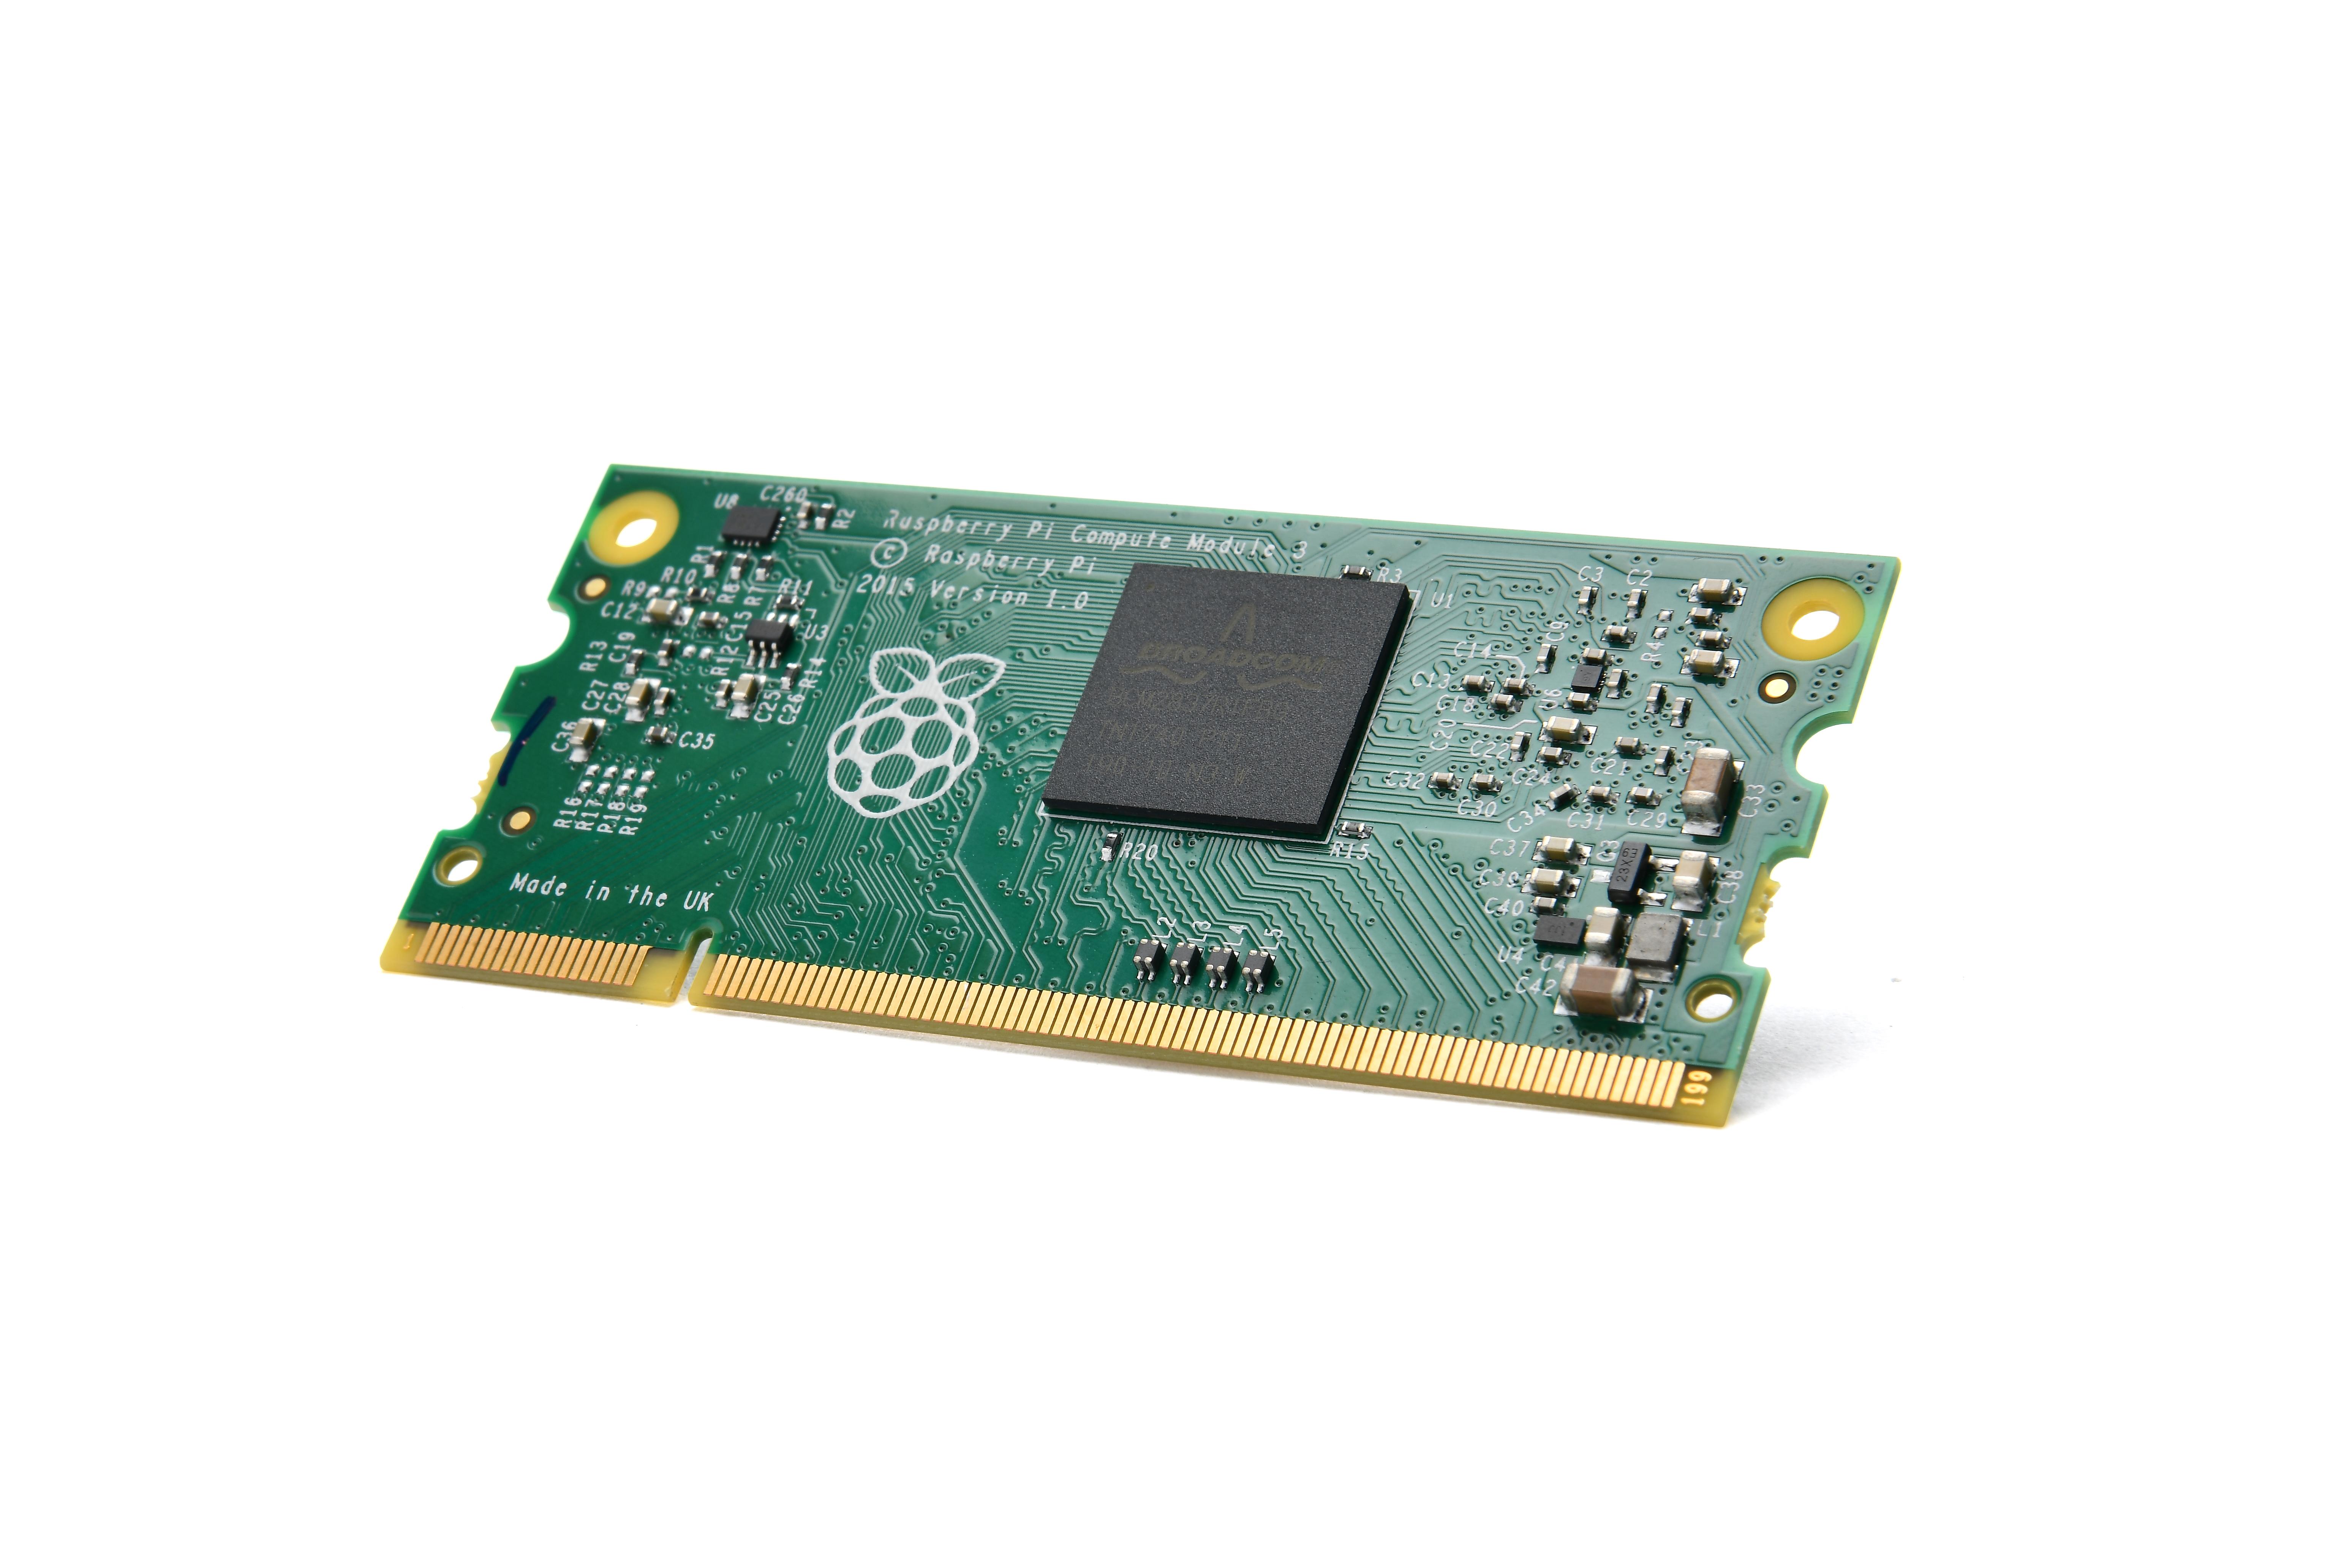 Raspberry Pi(ラズベリーパイ)Compute Module 3